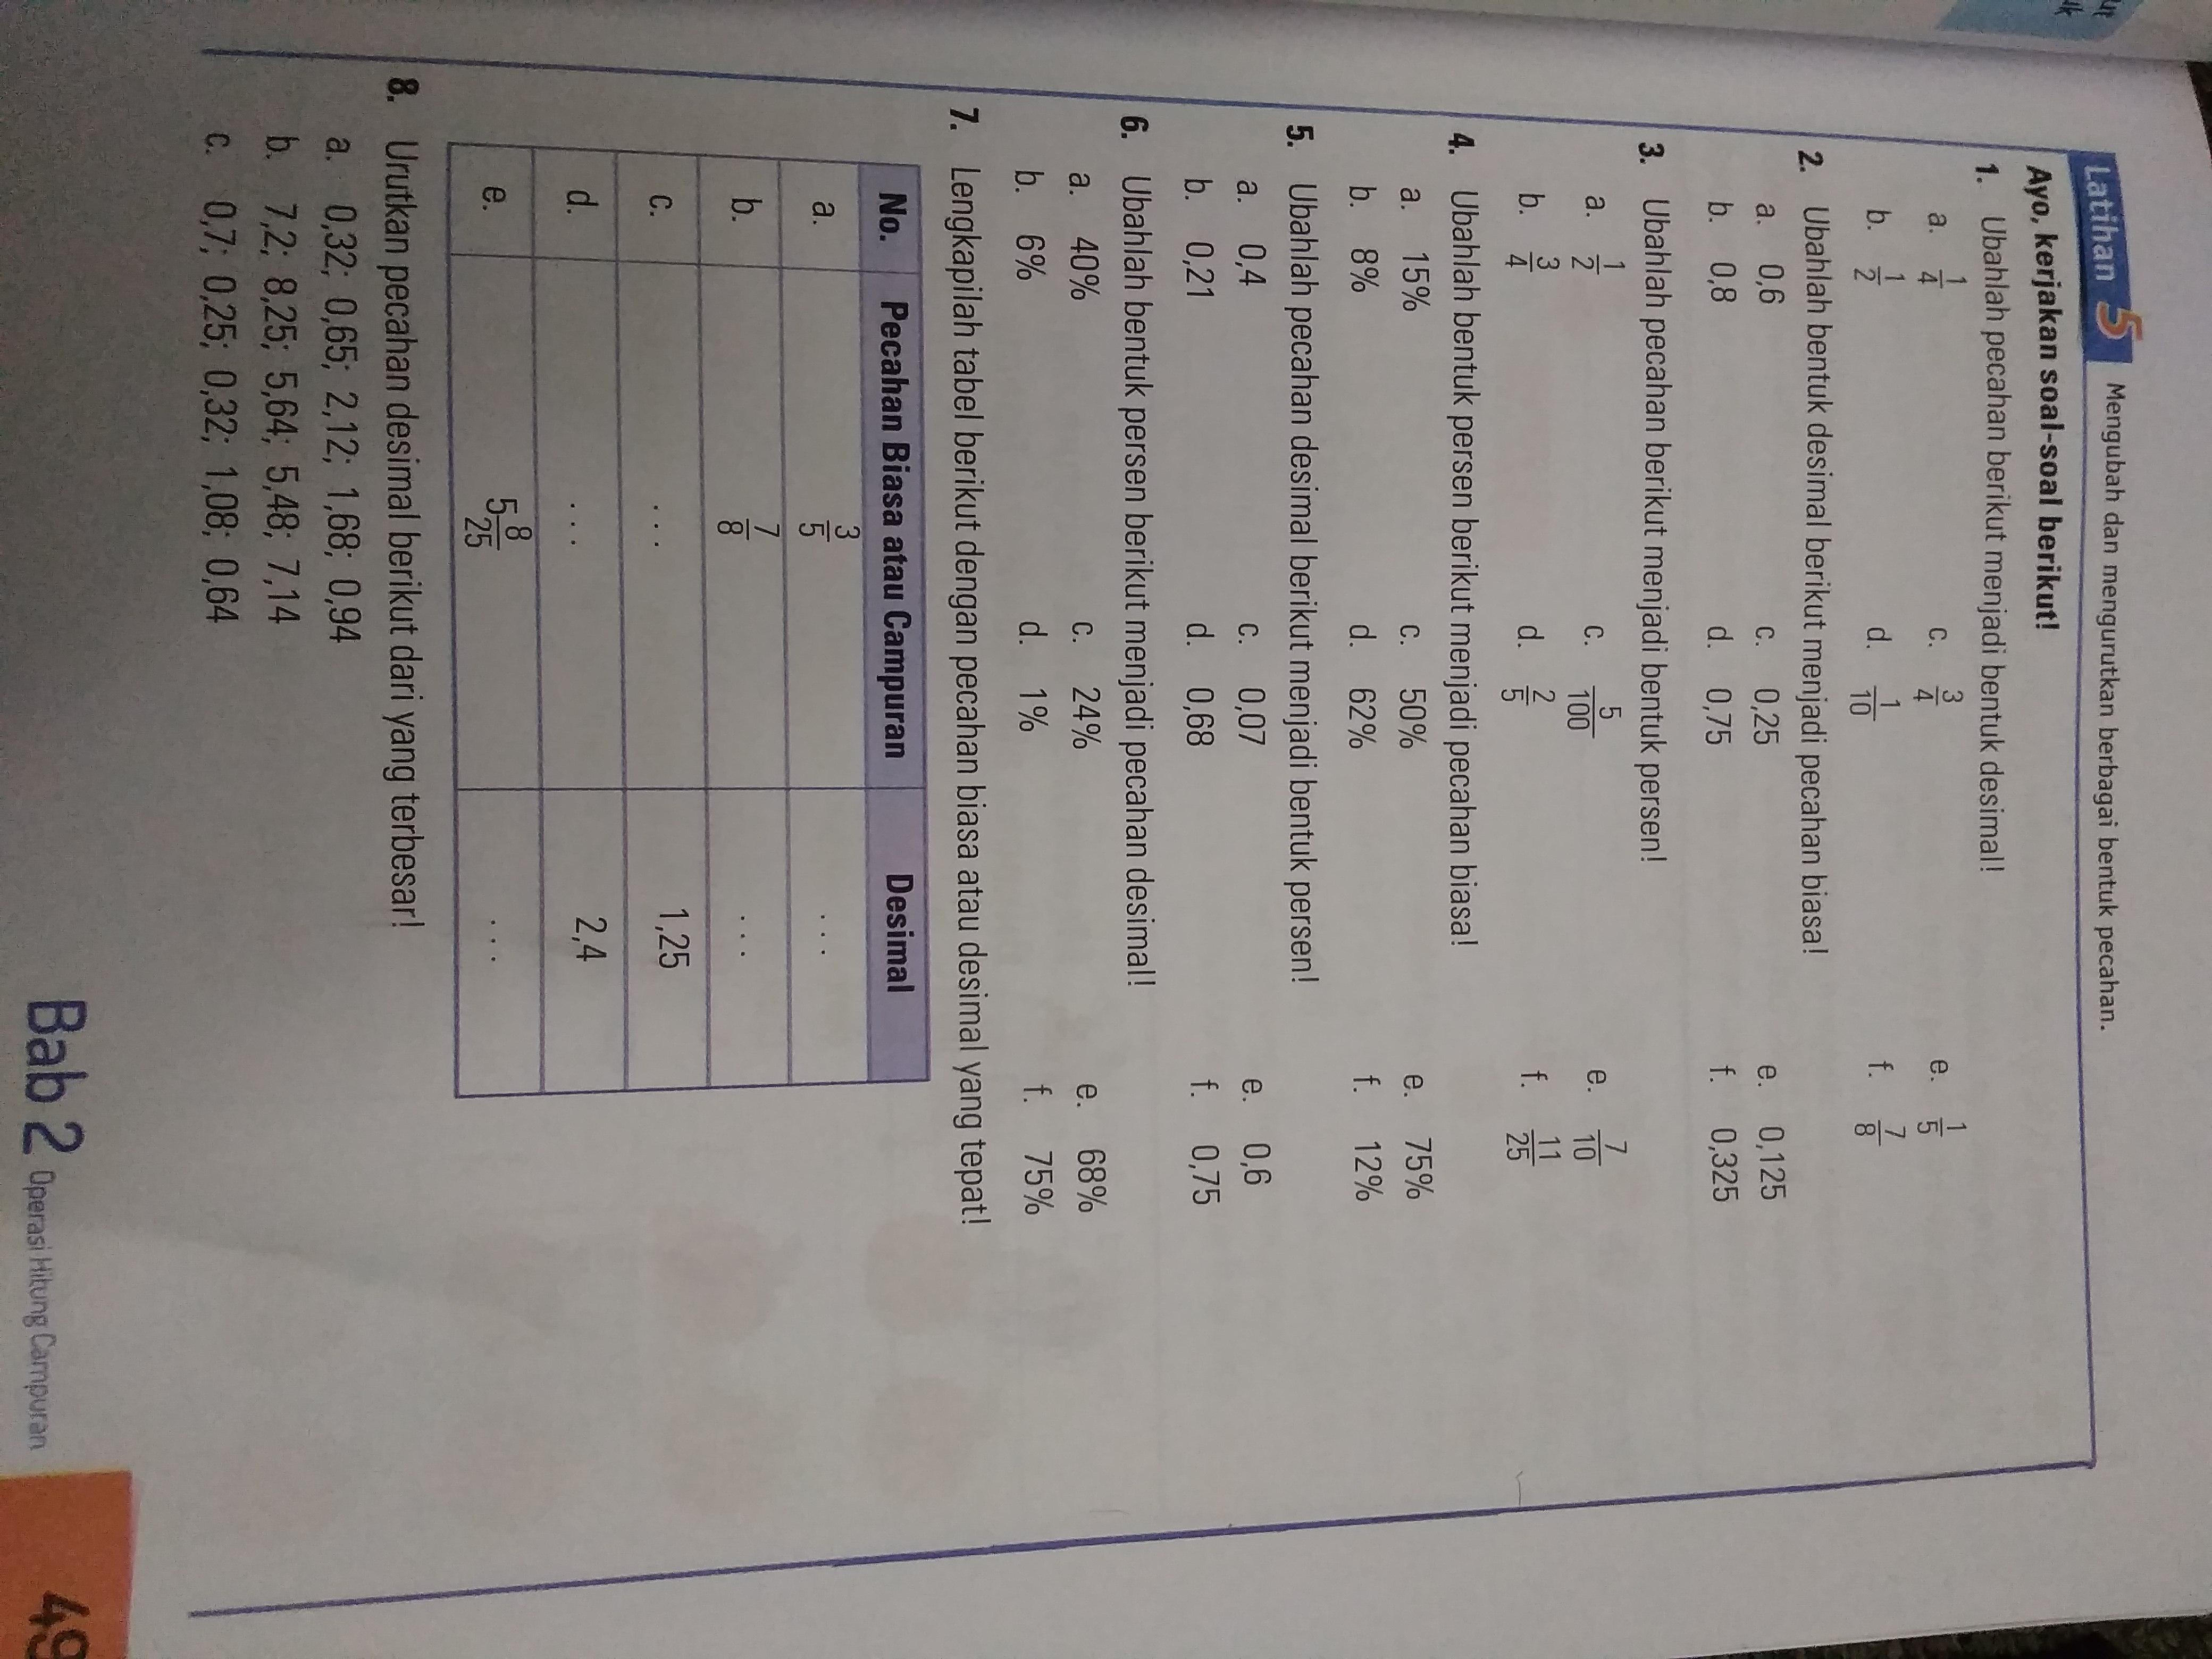 Matematika Kelas 6 Halaman 49 Esps Brainly Co Id